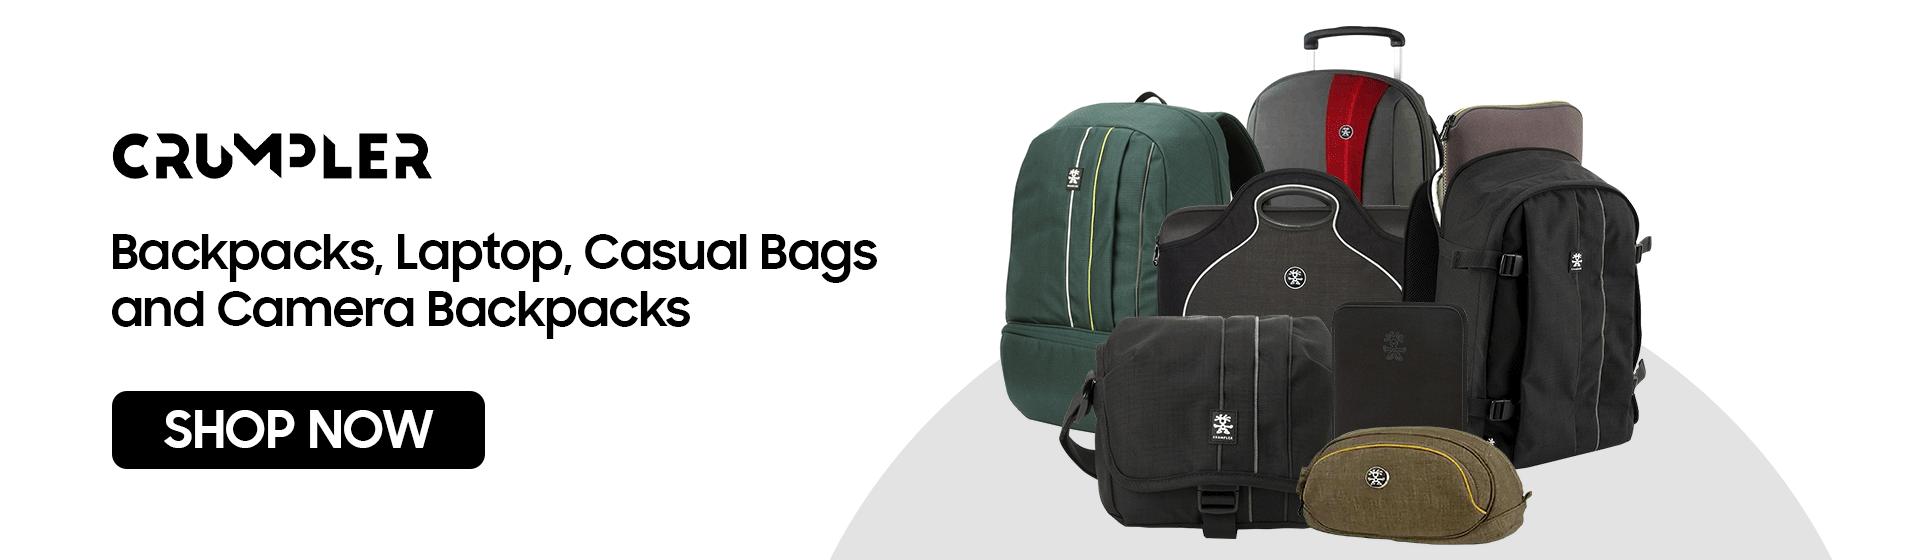 Crumpler Bags